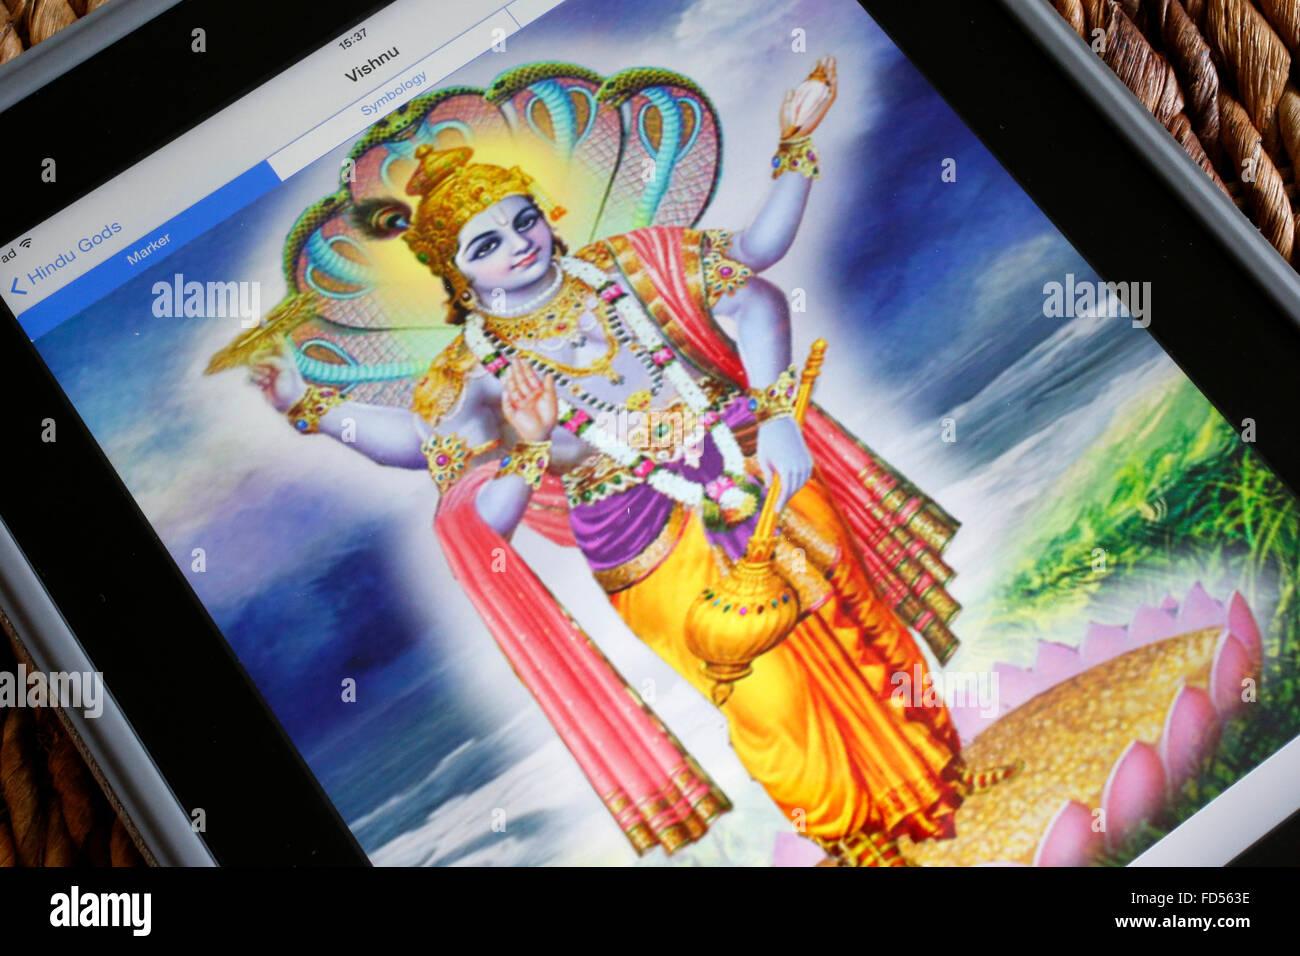 Hindu deity on an Ipad. Vishnu. - Stock Image